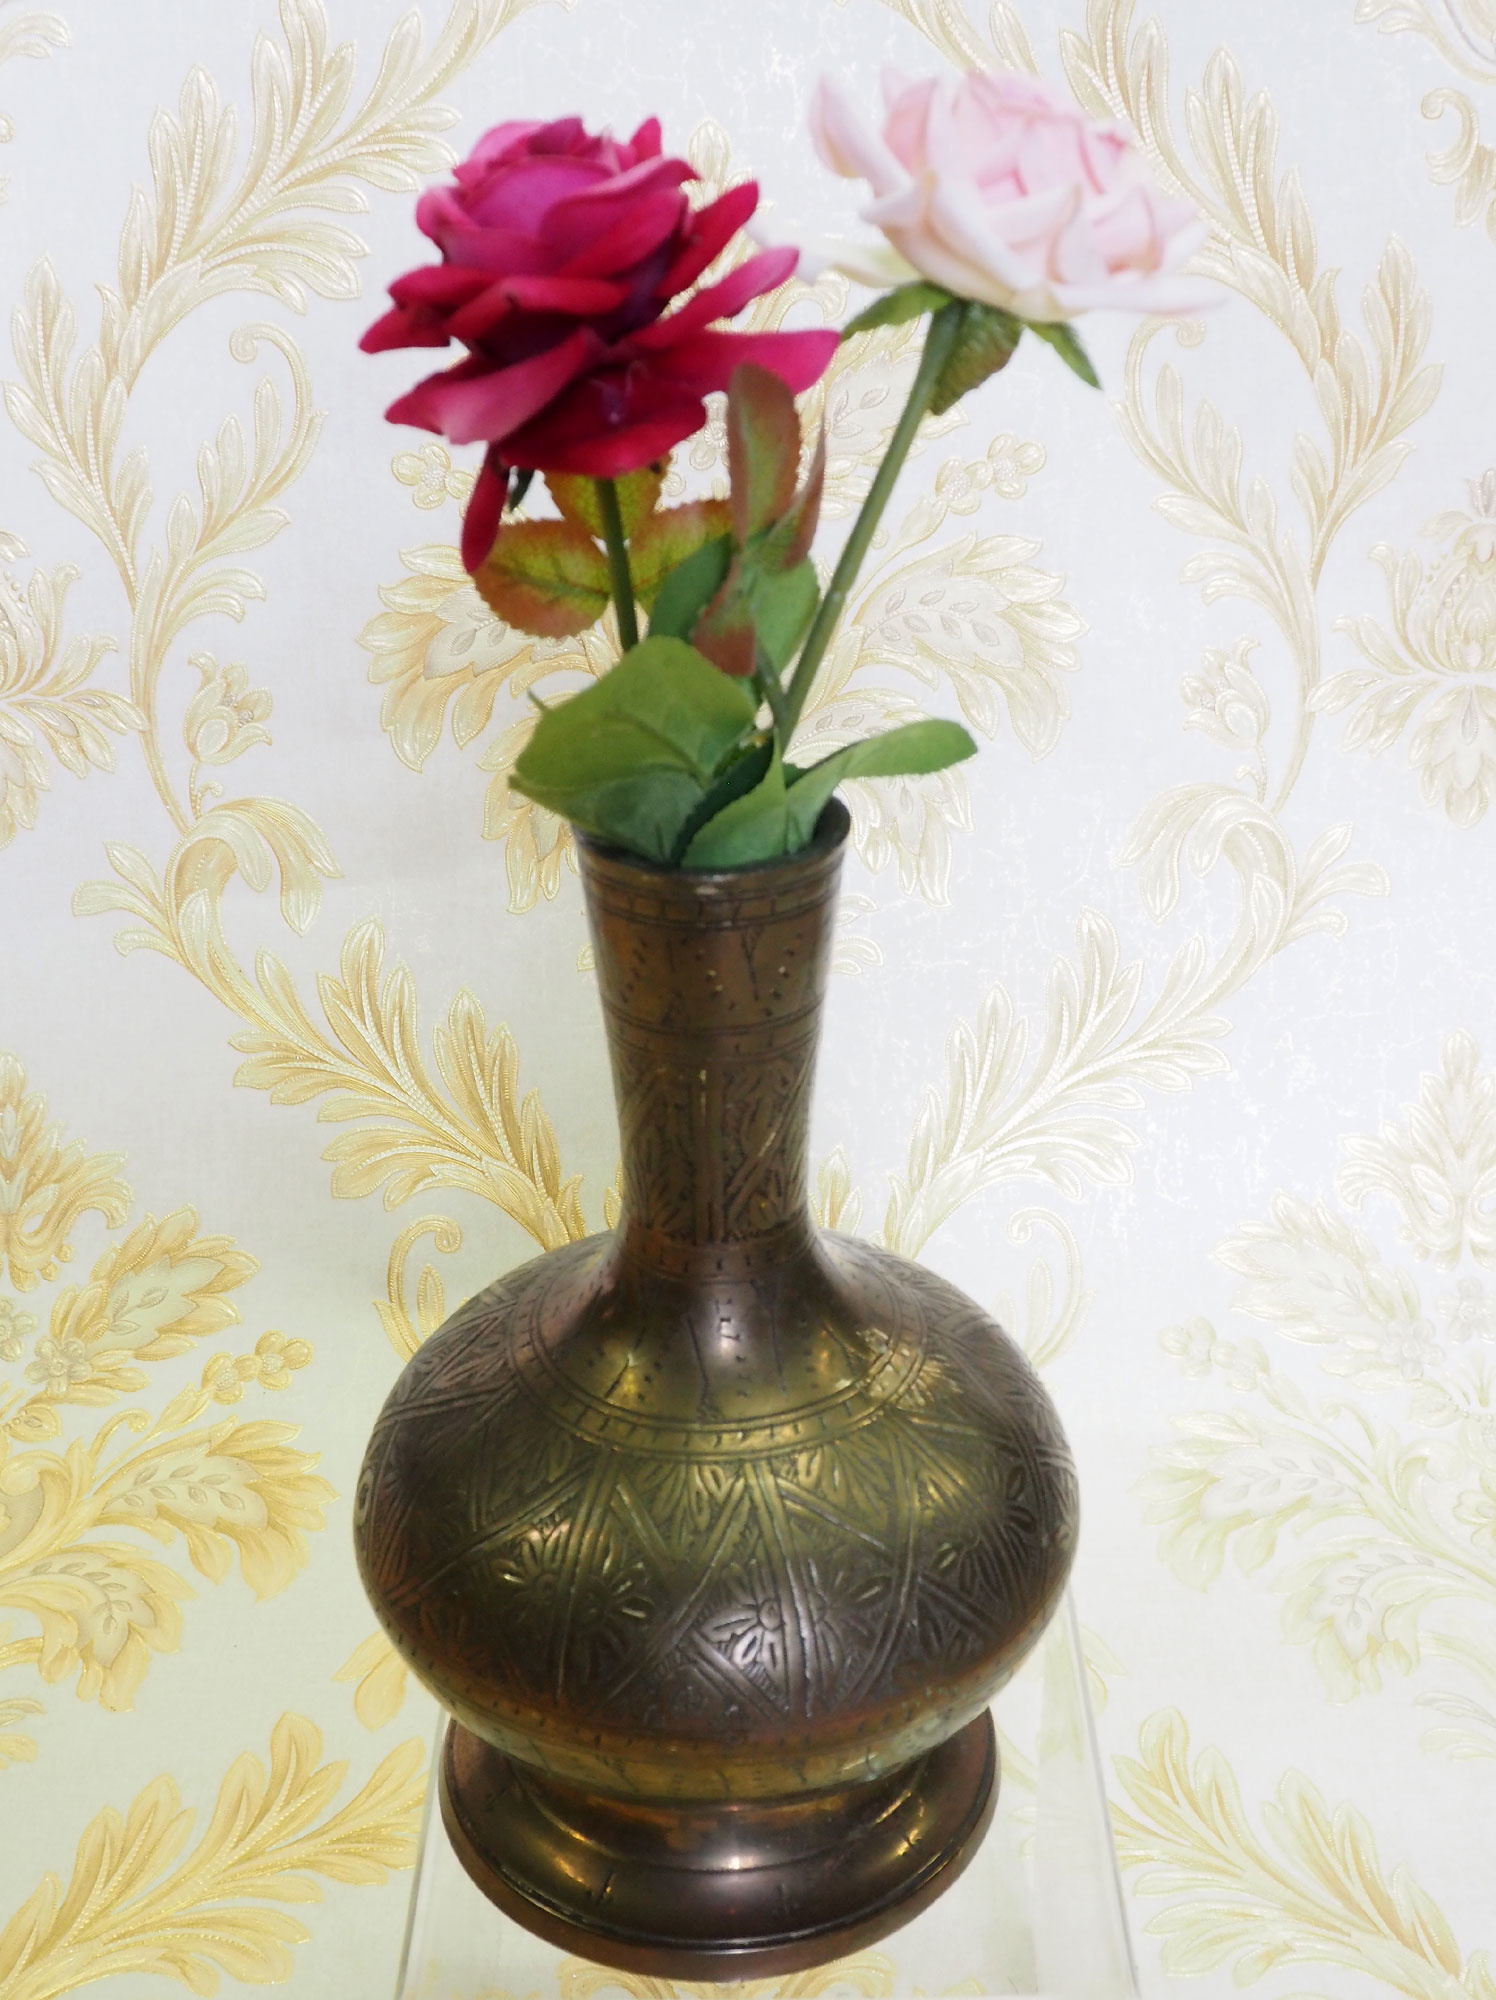 antik Massiv islamische Messing Wasserpfeife shisha Hookahs Schischa nargile Kalian aus Afghanistan Nr:19/11